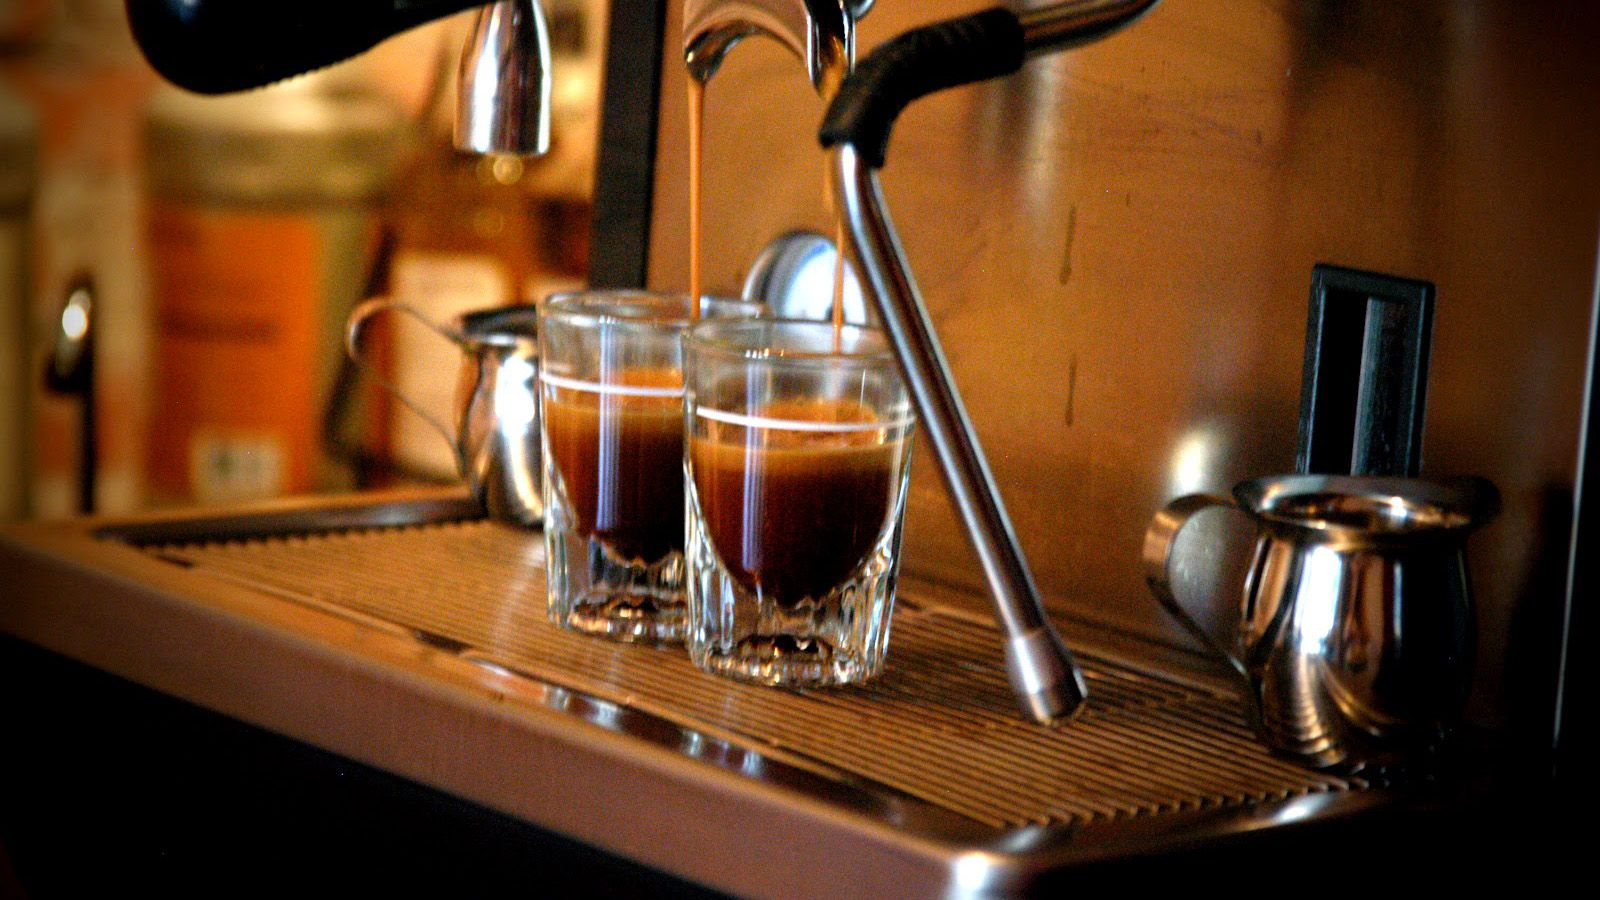 espresso1.jpg (1600×900)